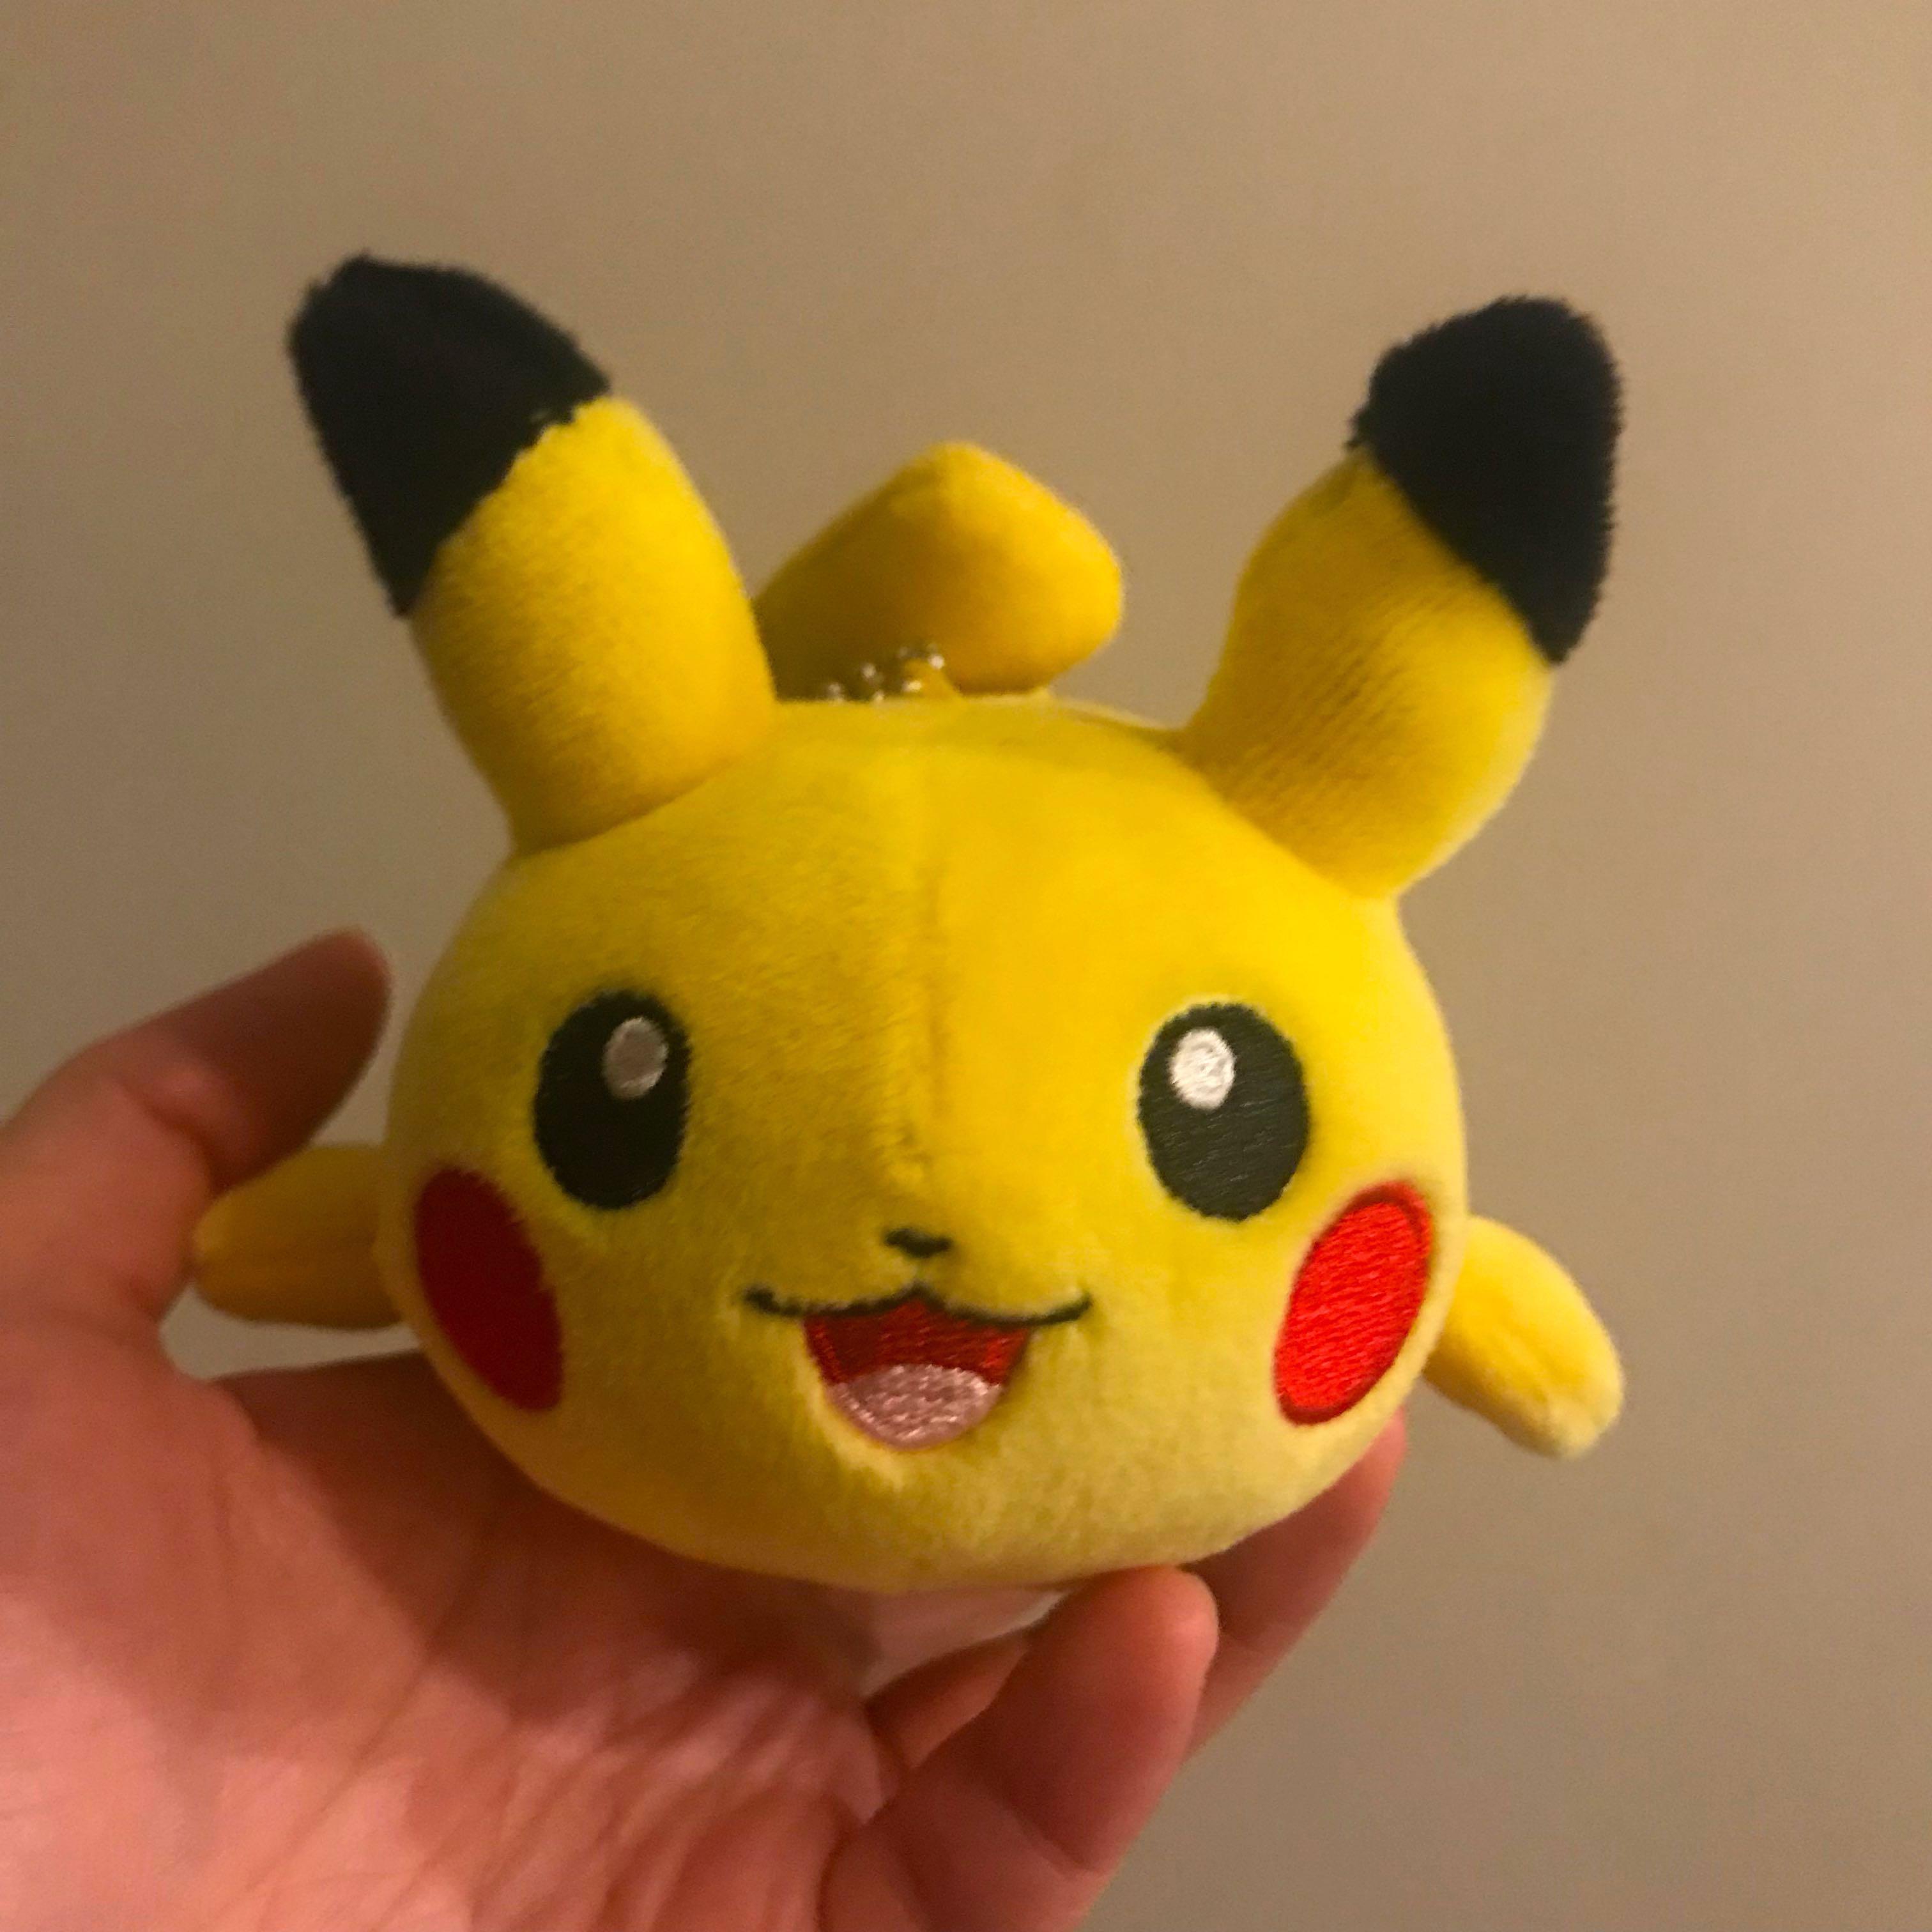 Pikachu Mochi Plush Toy from Japan